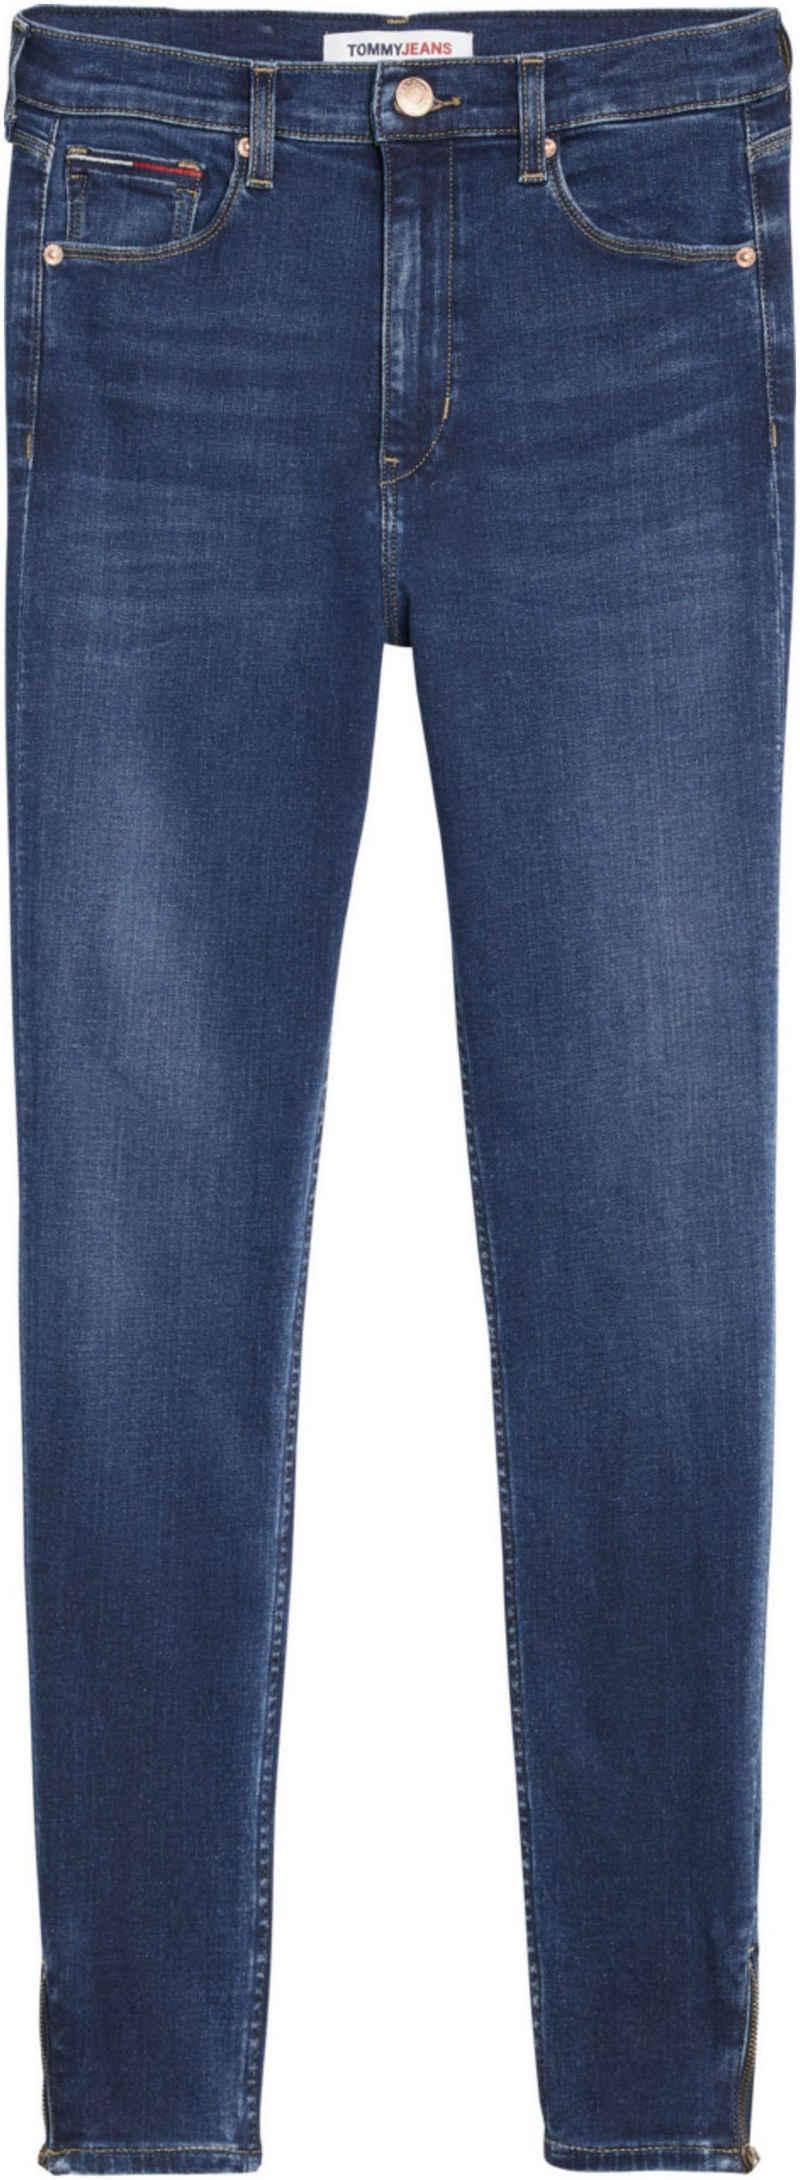 Tommy Jeans Skinny-fit-Jeans »SYLVIA HR SKNY NKL ZP BE154 DBST« mit Tommy Jeans Logo-Flag